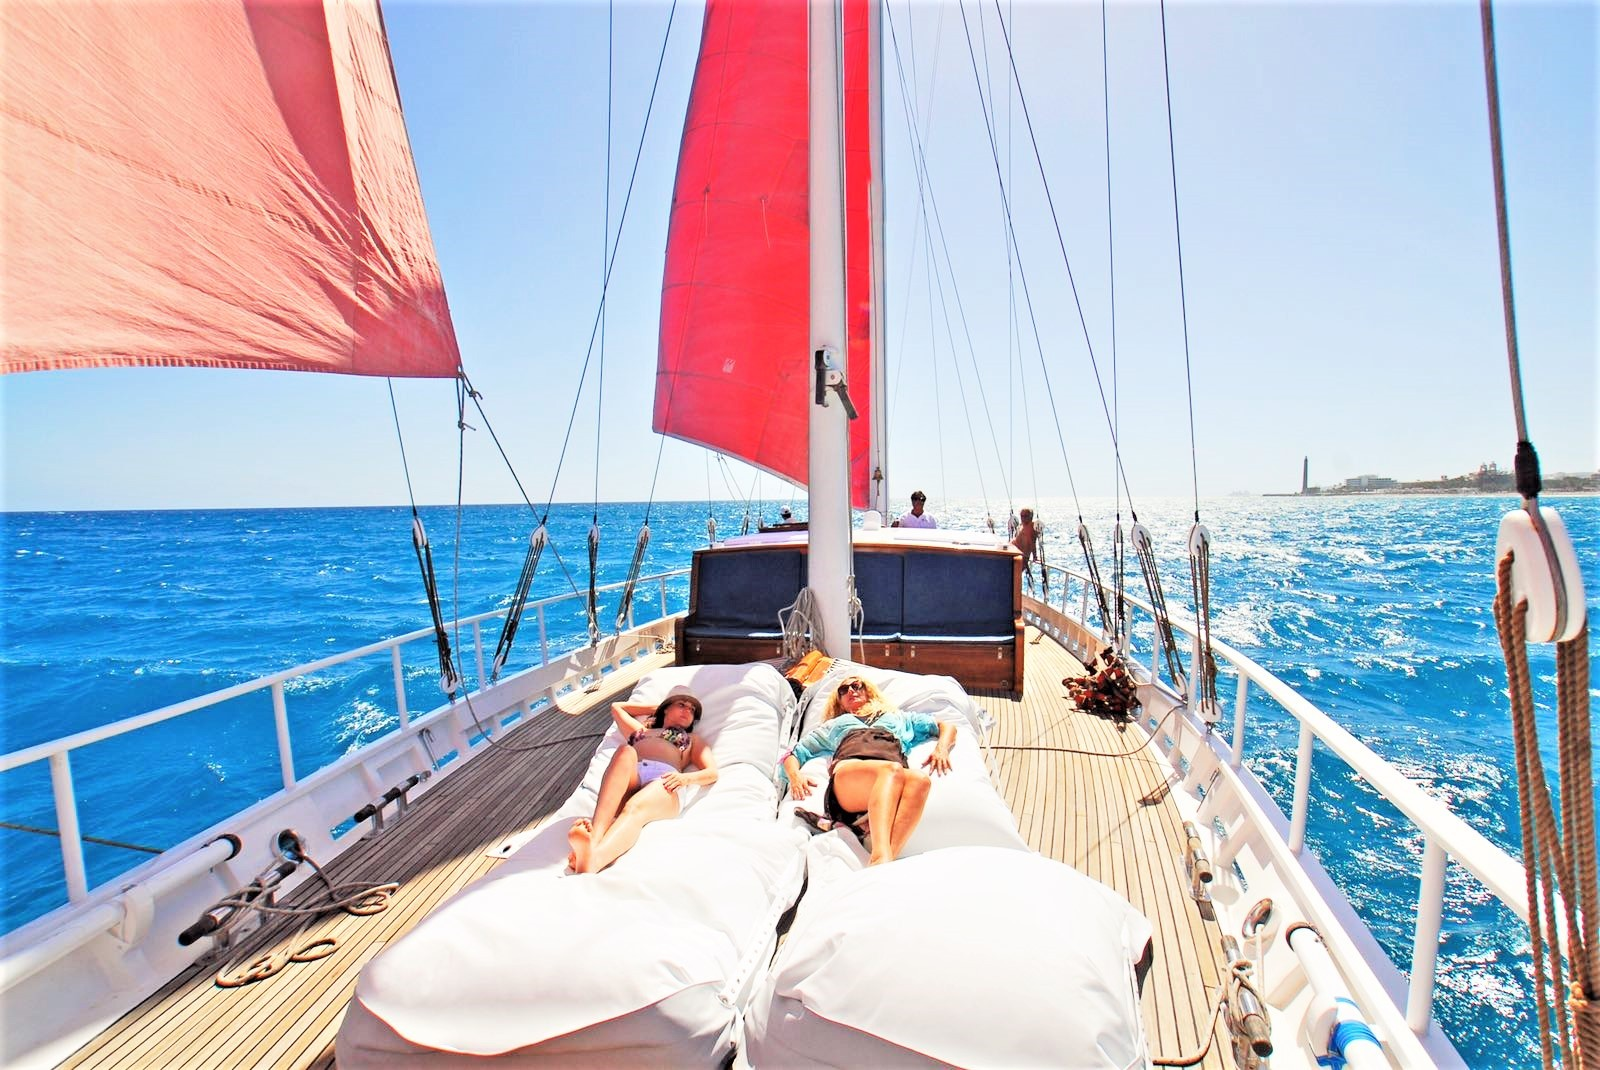 Privat seilyachttur på Gran Canaria